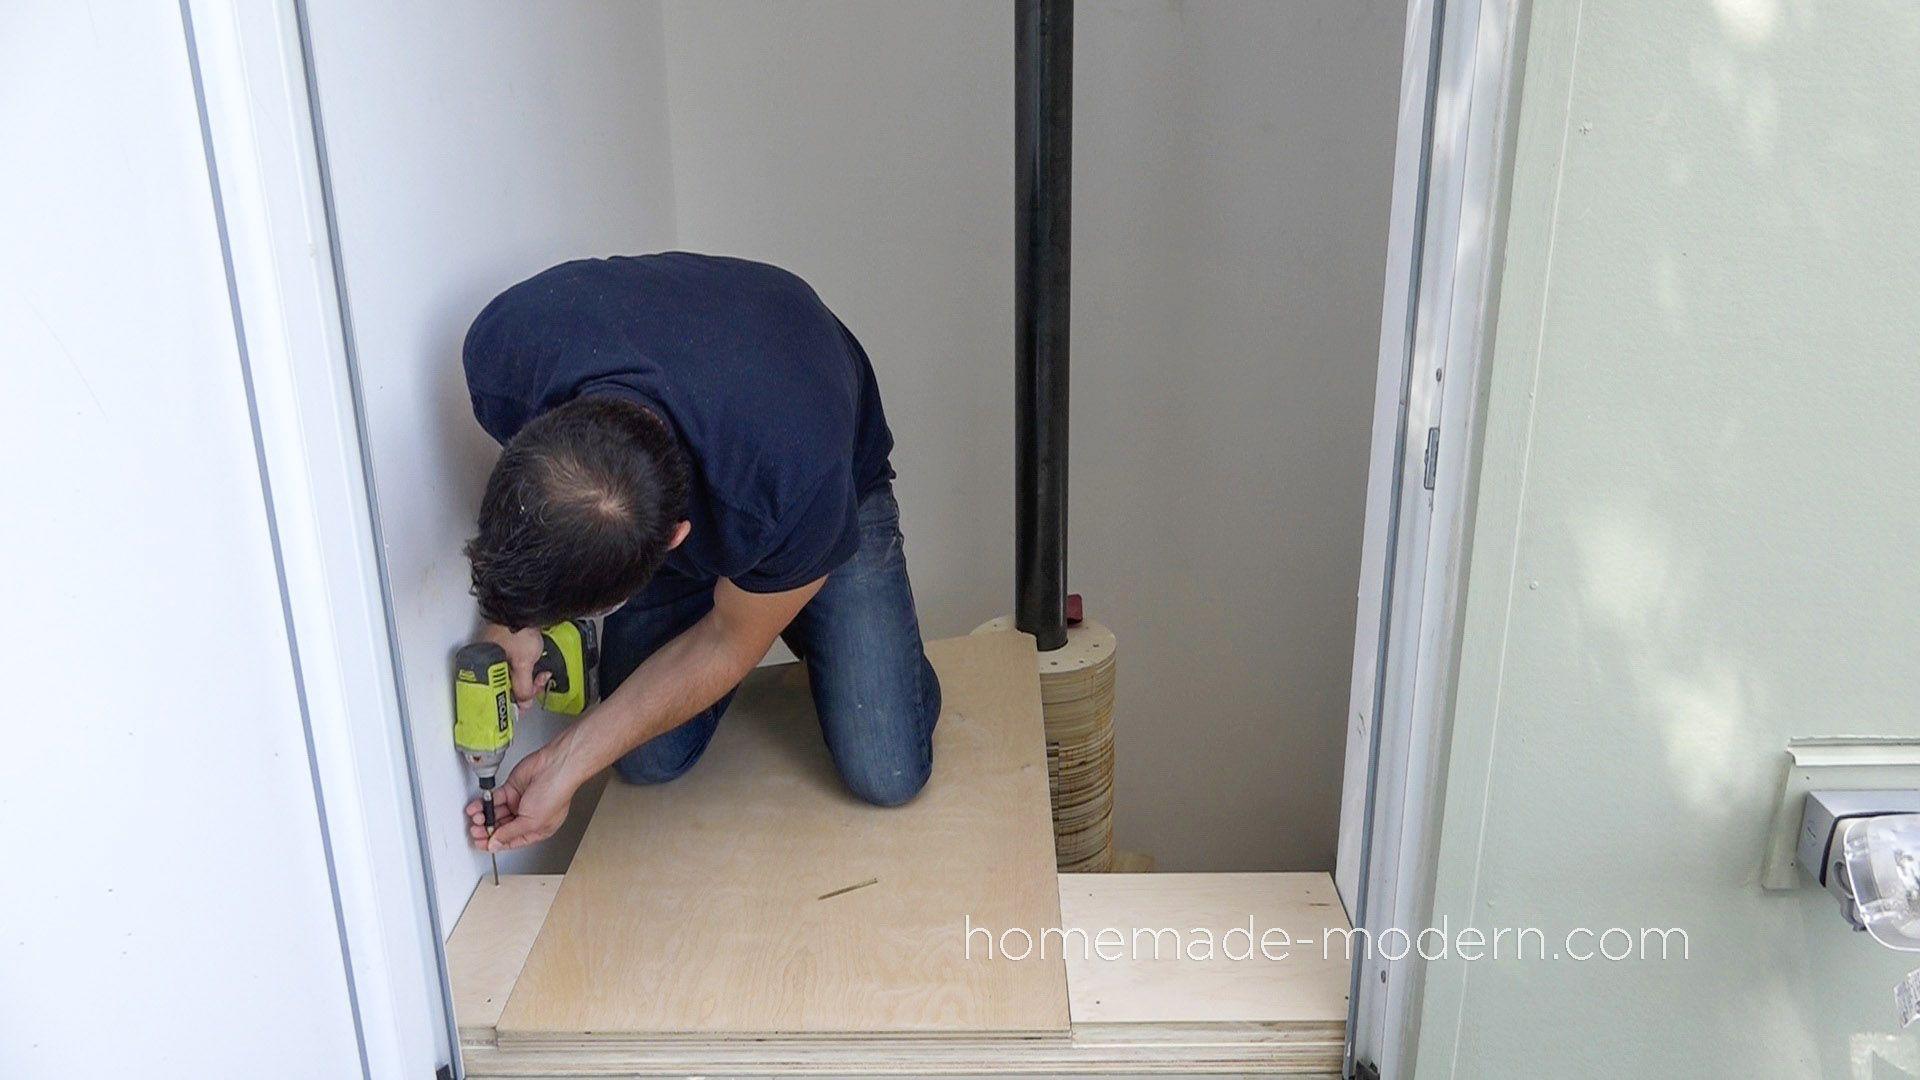 Best Homemade Modern Diy Ep99 Diy Cnc Spiral Staircase 640 x 480